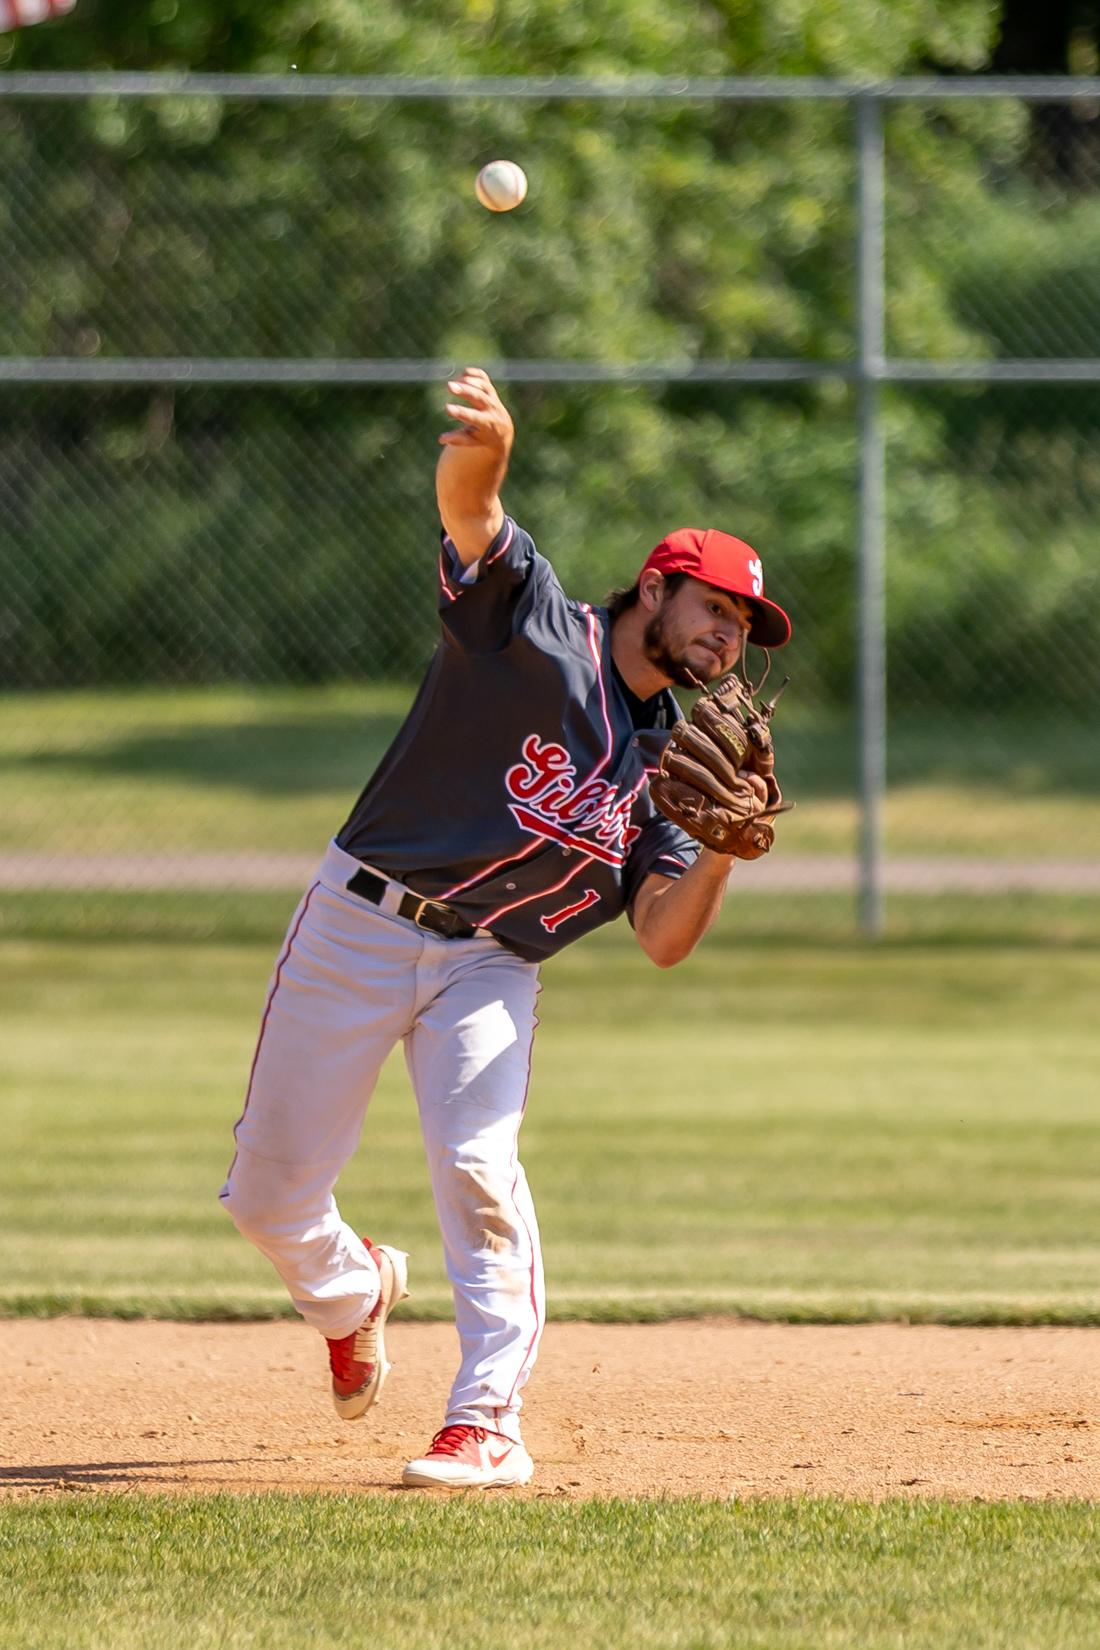 Second baseman Nolan Huiras fires the ball to first for an out.